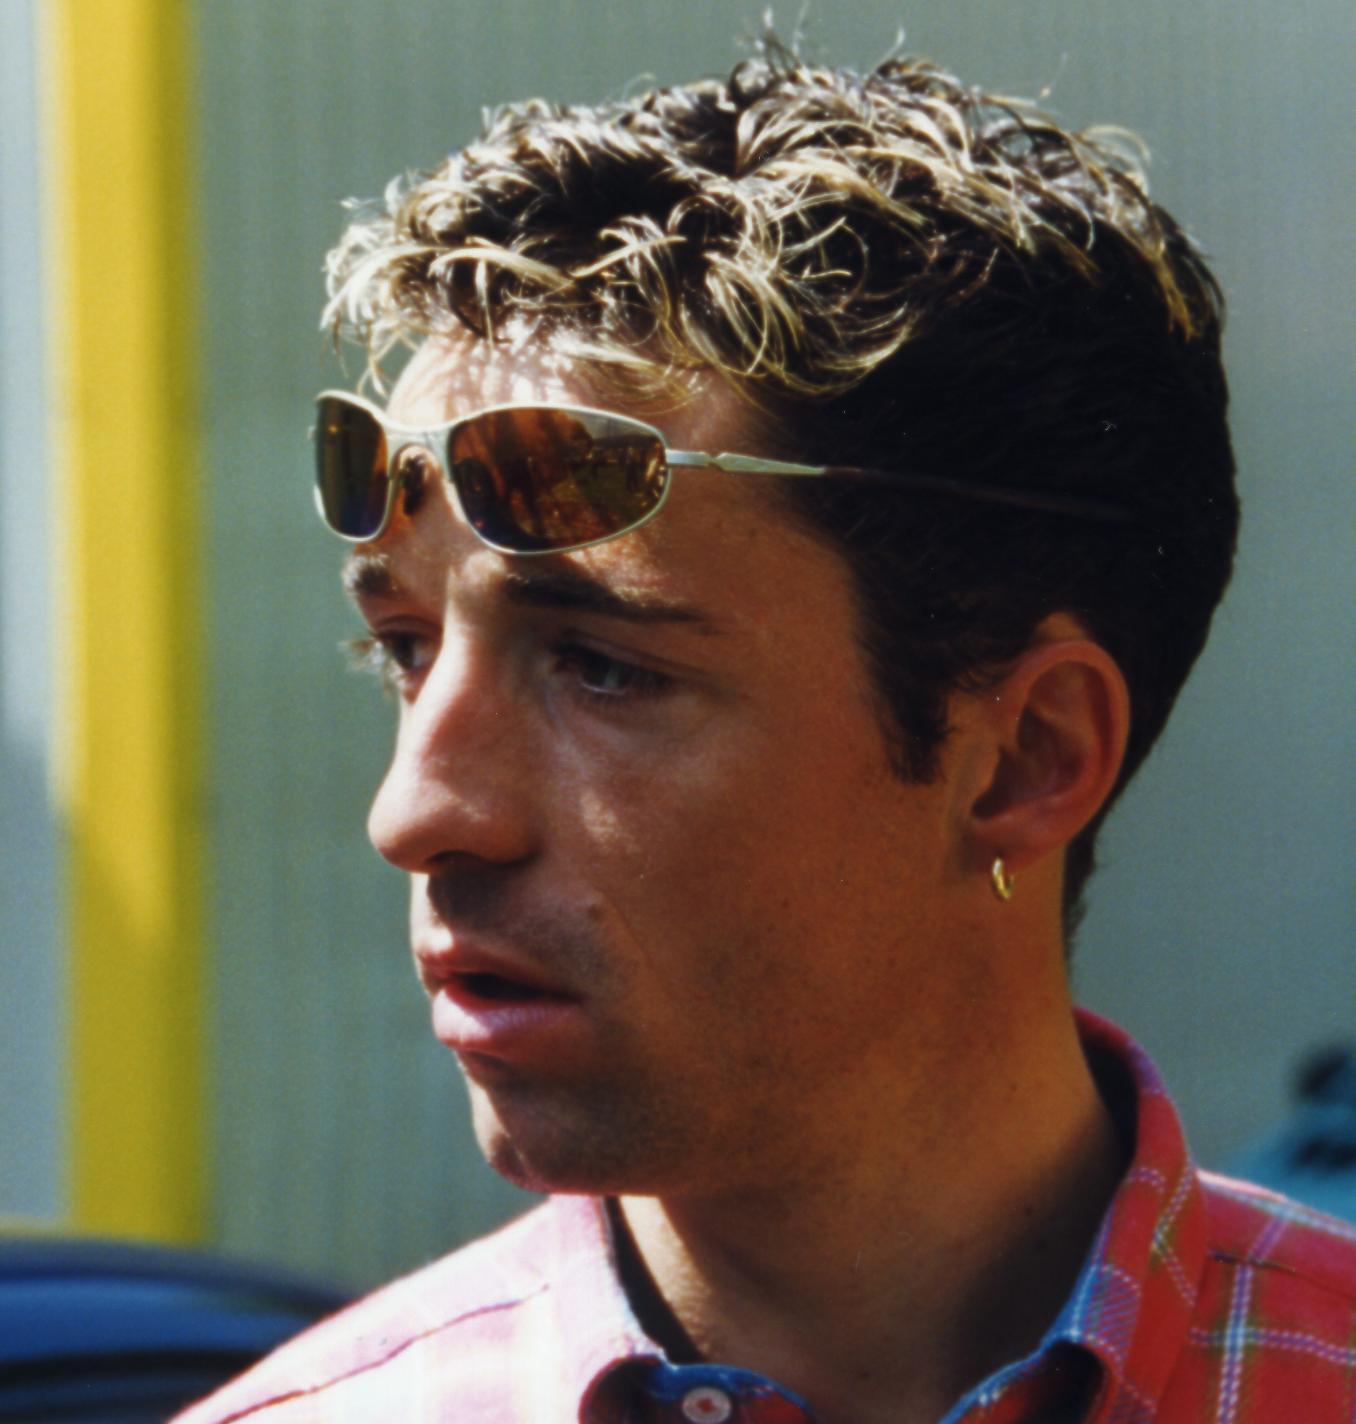 Laurent Roux